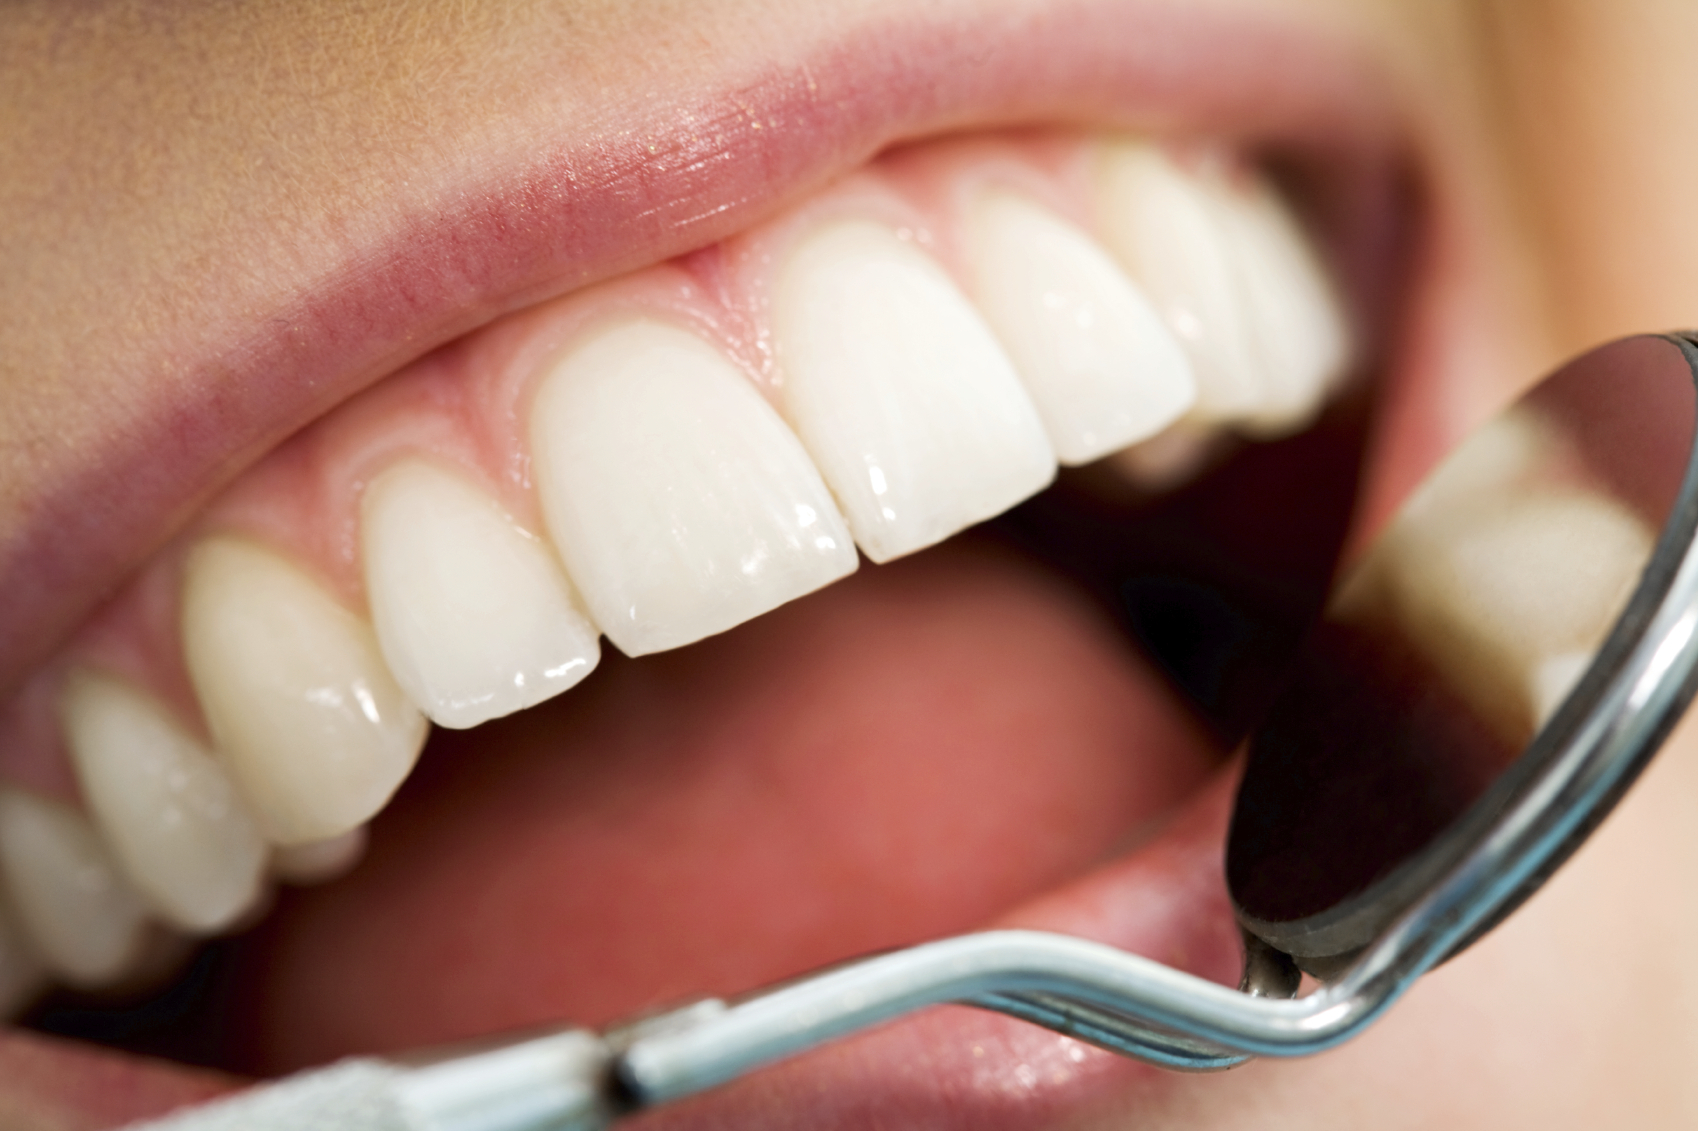 Individual Dental Insurance Plan - 4 Things to Check Before Buying